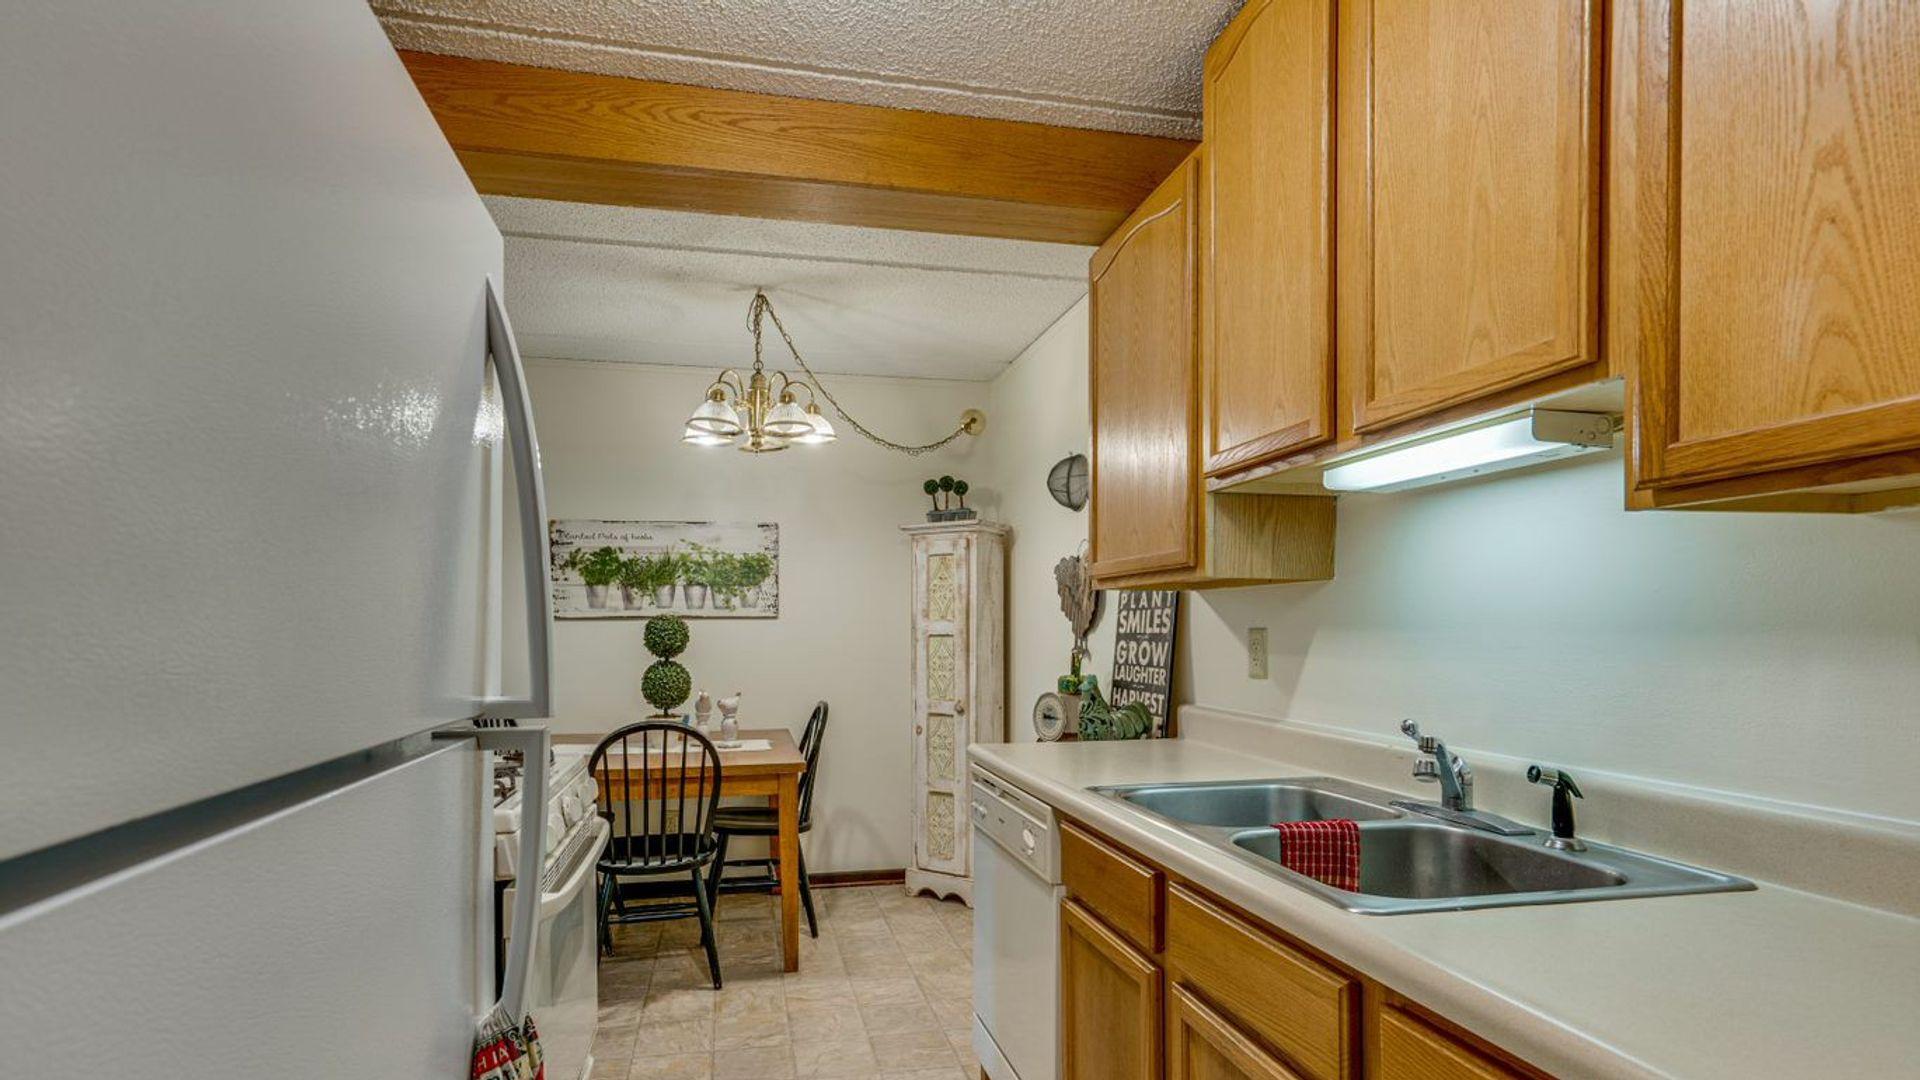 2 bed apartment at 347 Putnam Street, Mankato, MN 56001 ...